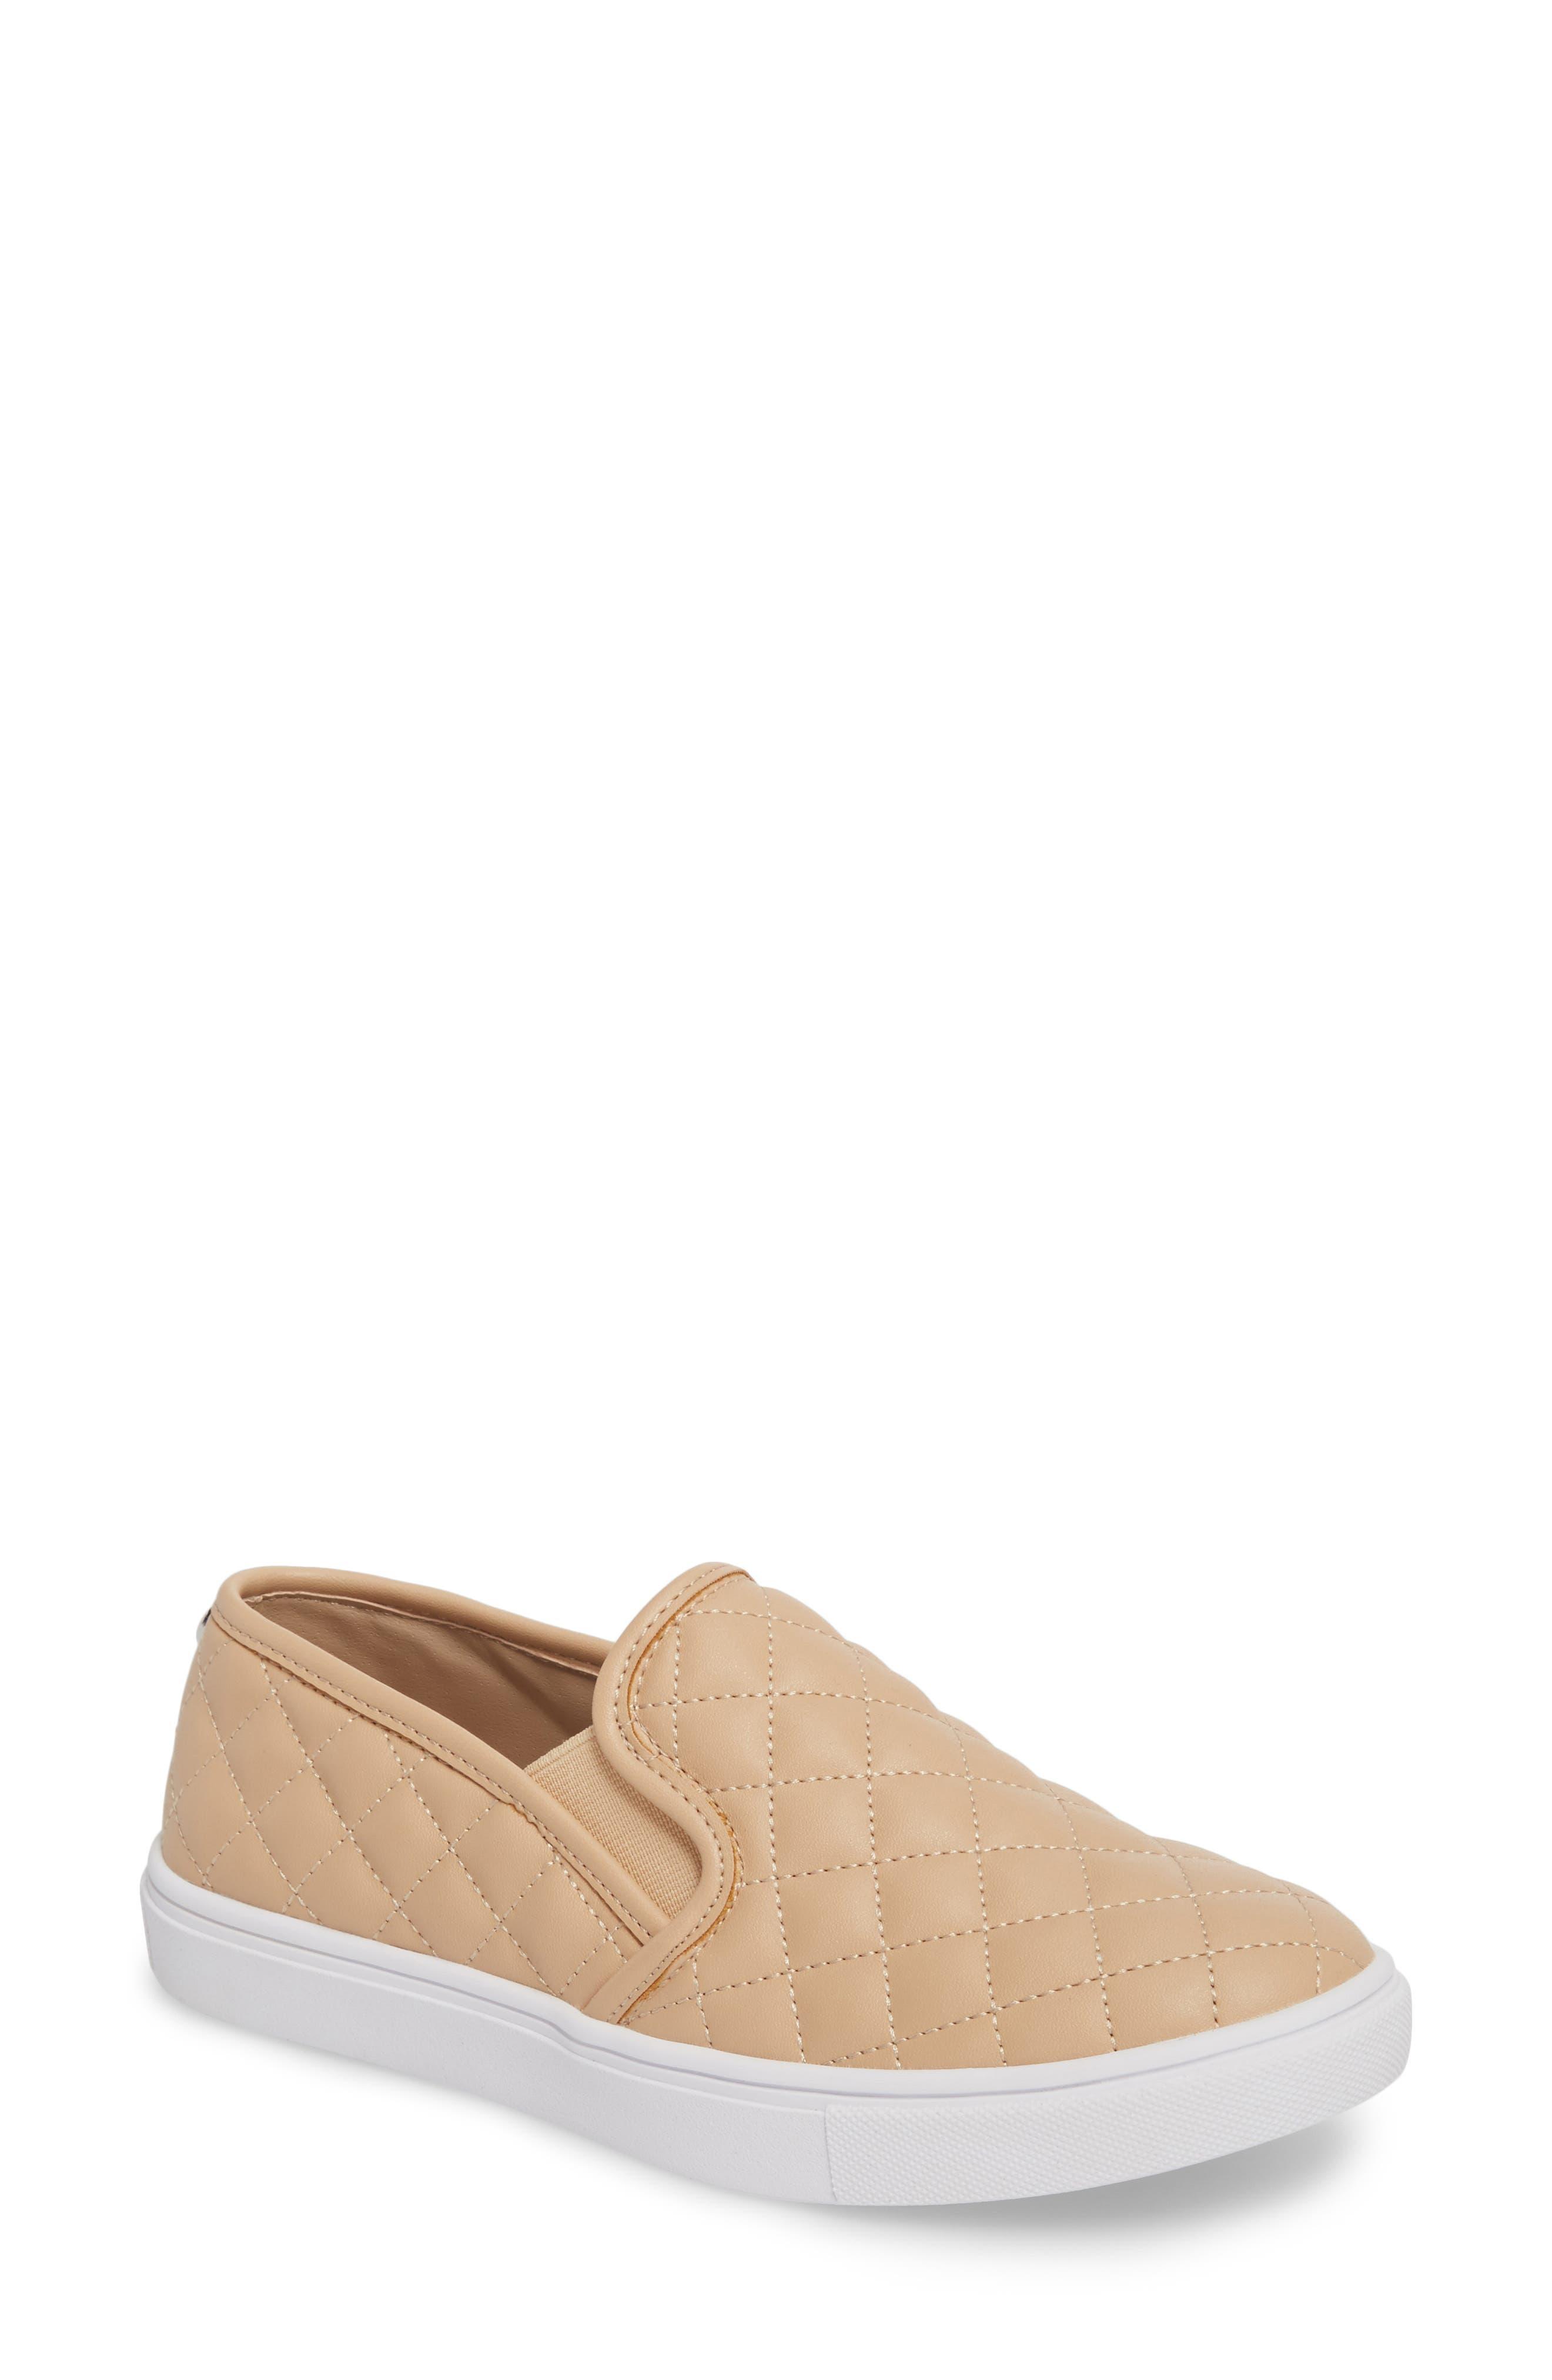 Ecentrcq Sneaker,                             Main thumbnail 1, color,                             250